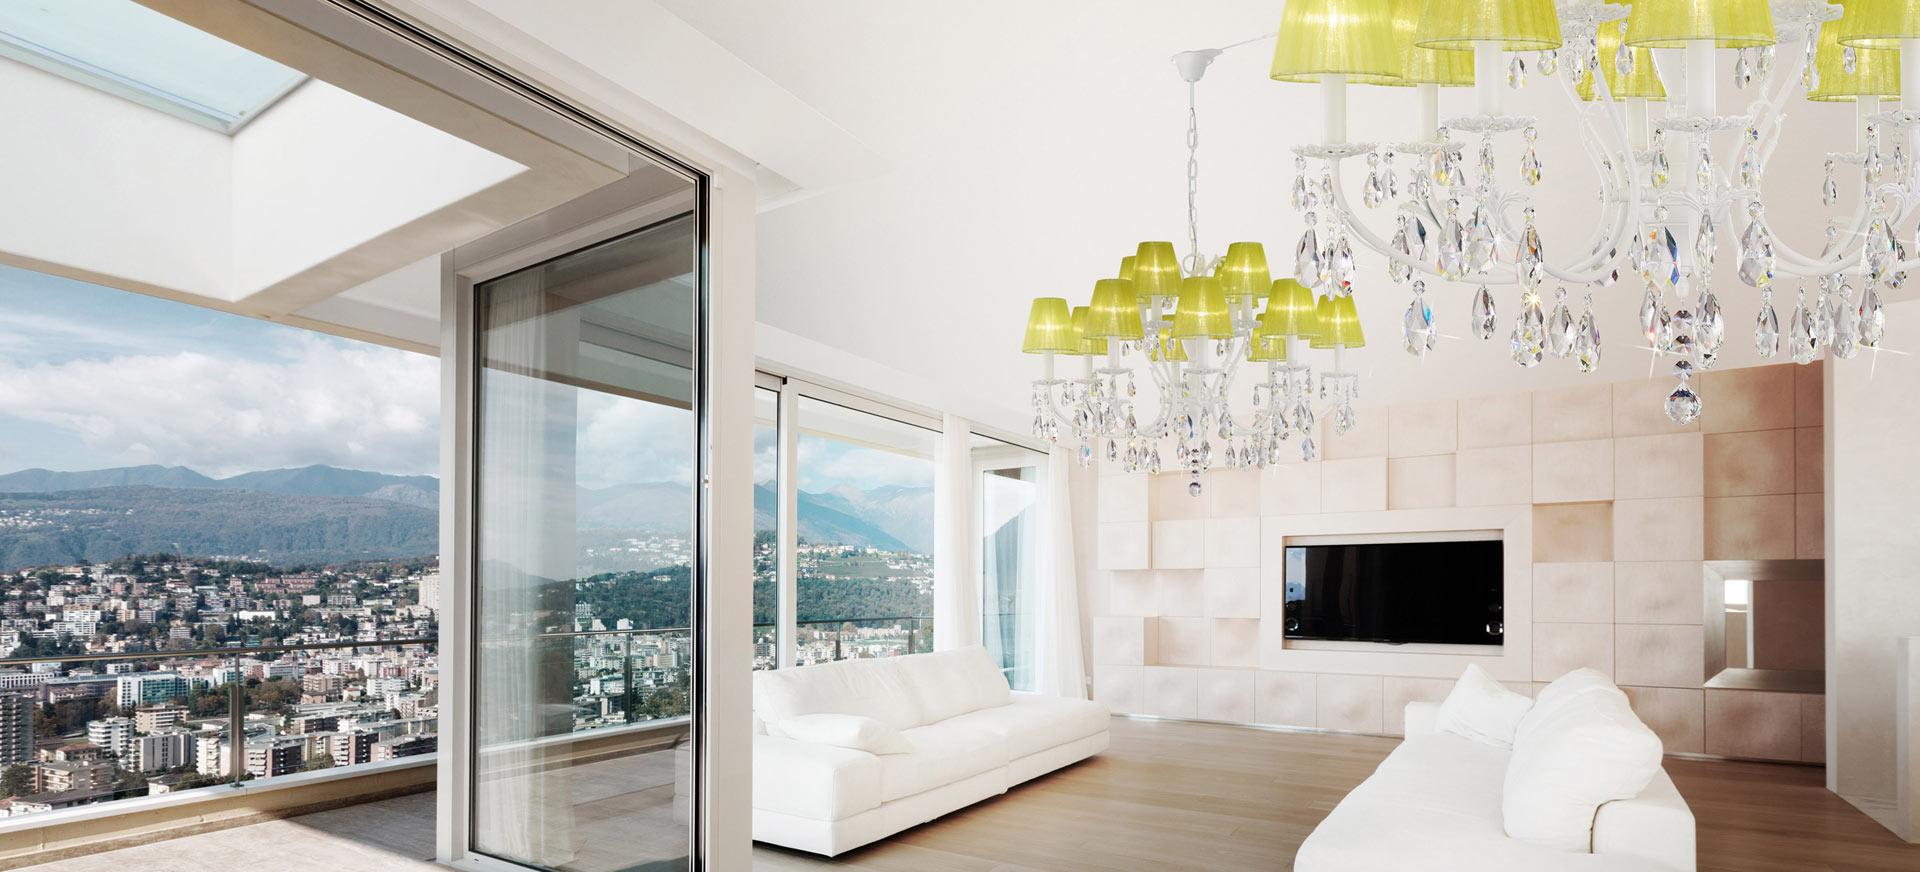 livingdesign frankfurt exklusive lampen und tapeten. Black Bedroom Furniture Sets. Home Design Ideas